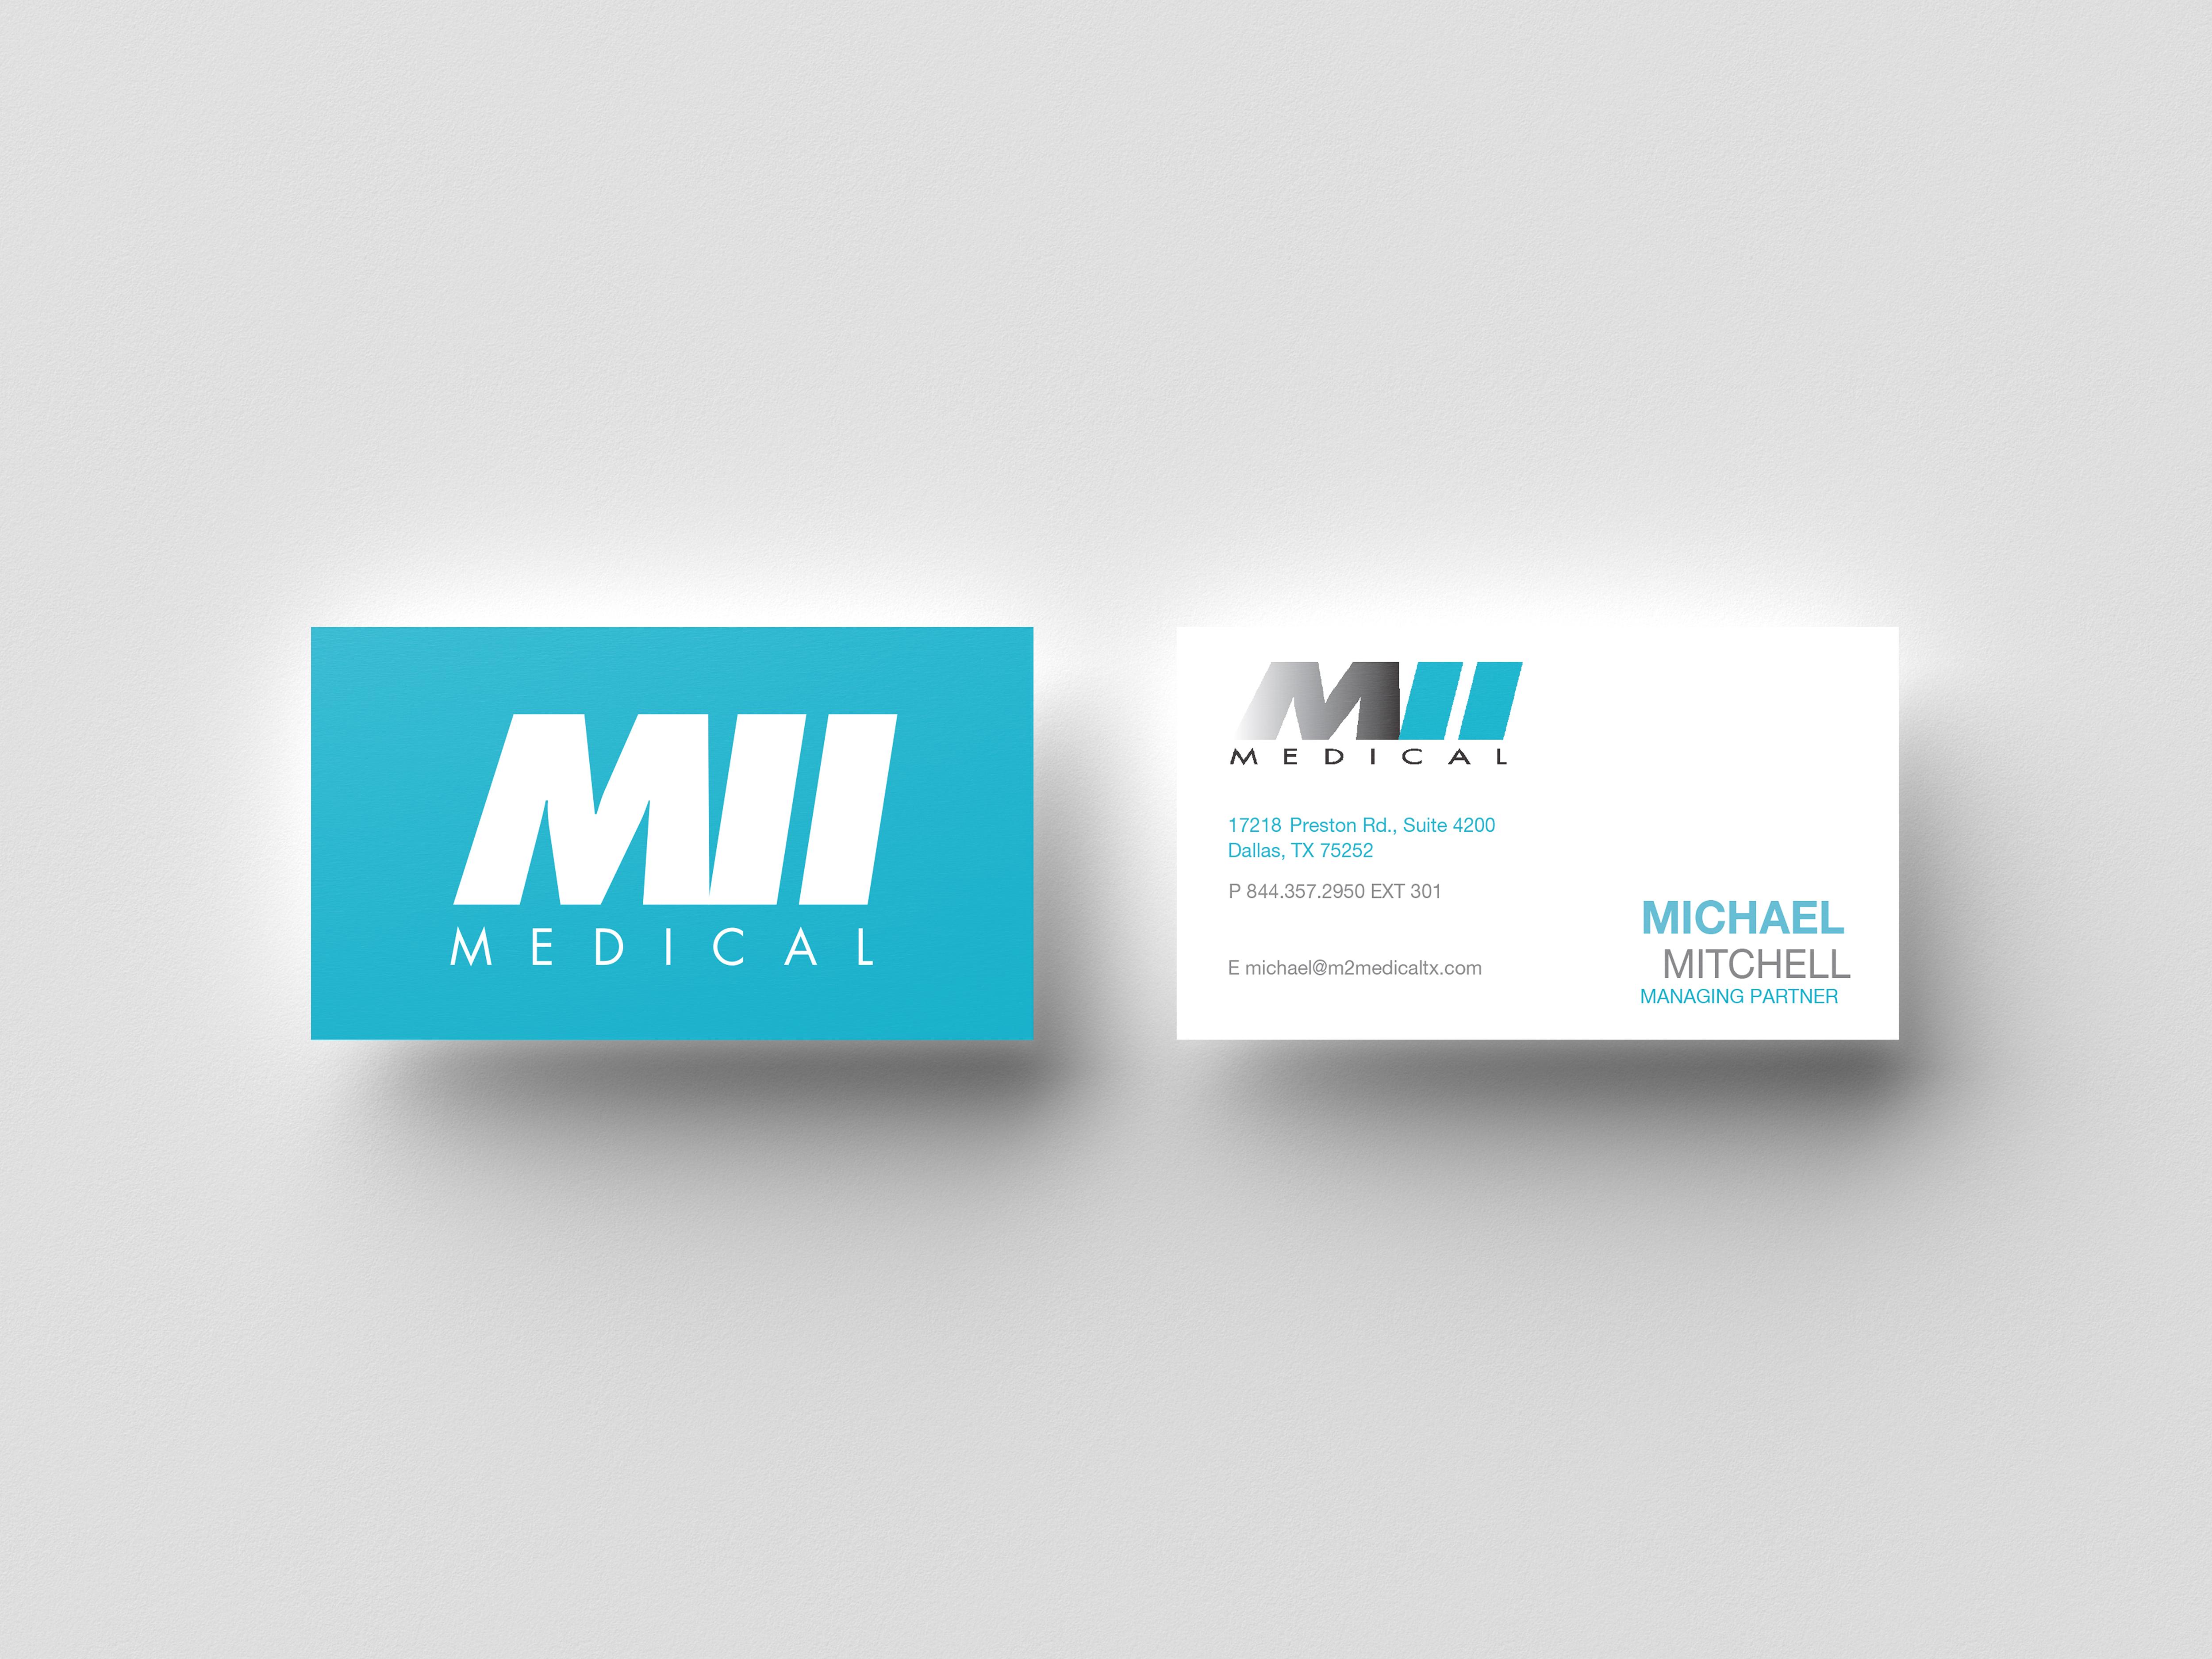 business cards business cards - Business Cards Dallas